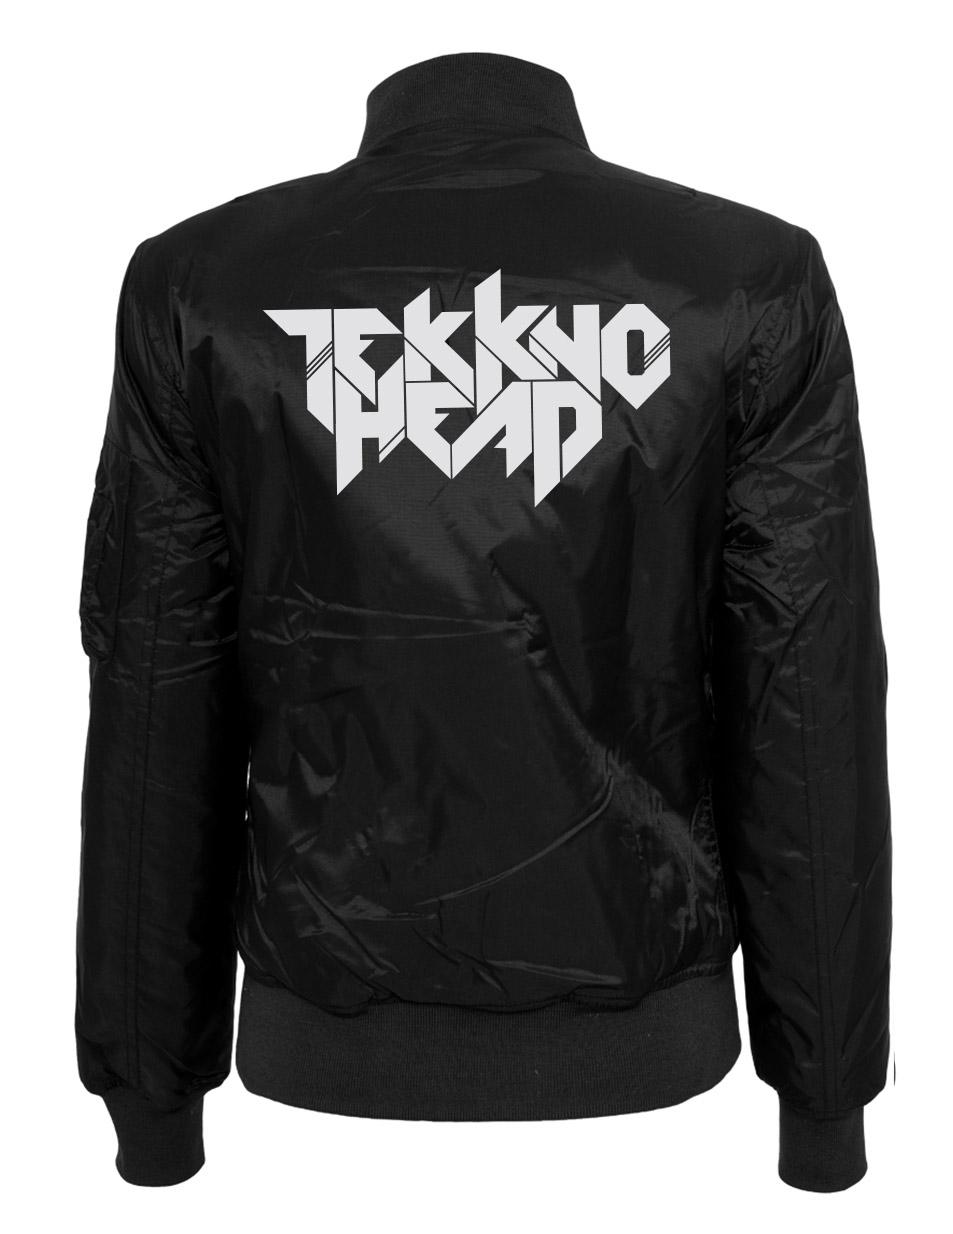 TEKKNOHEAD Ladies Bomber Jacket mehrfarbig auf schwarz